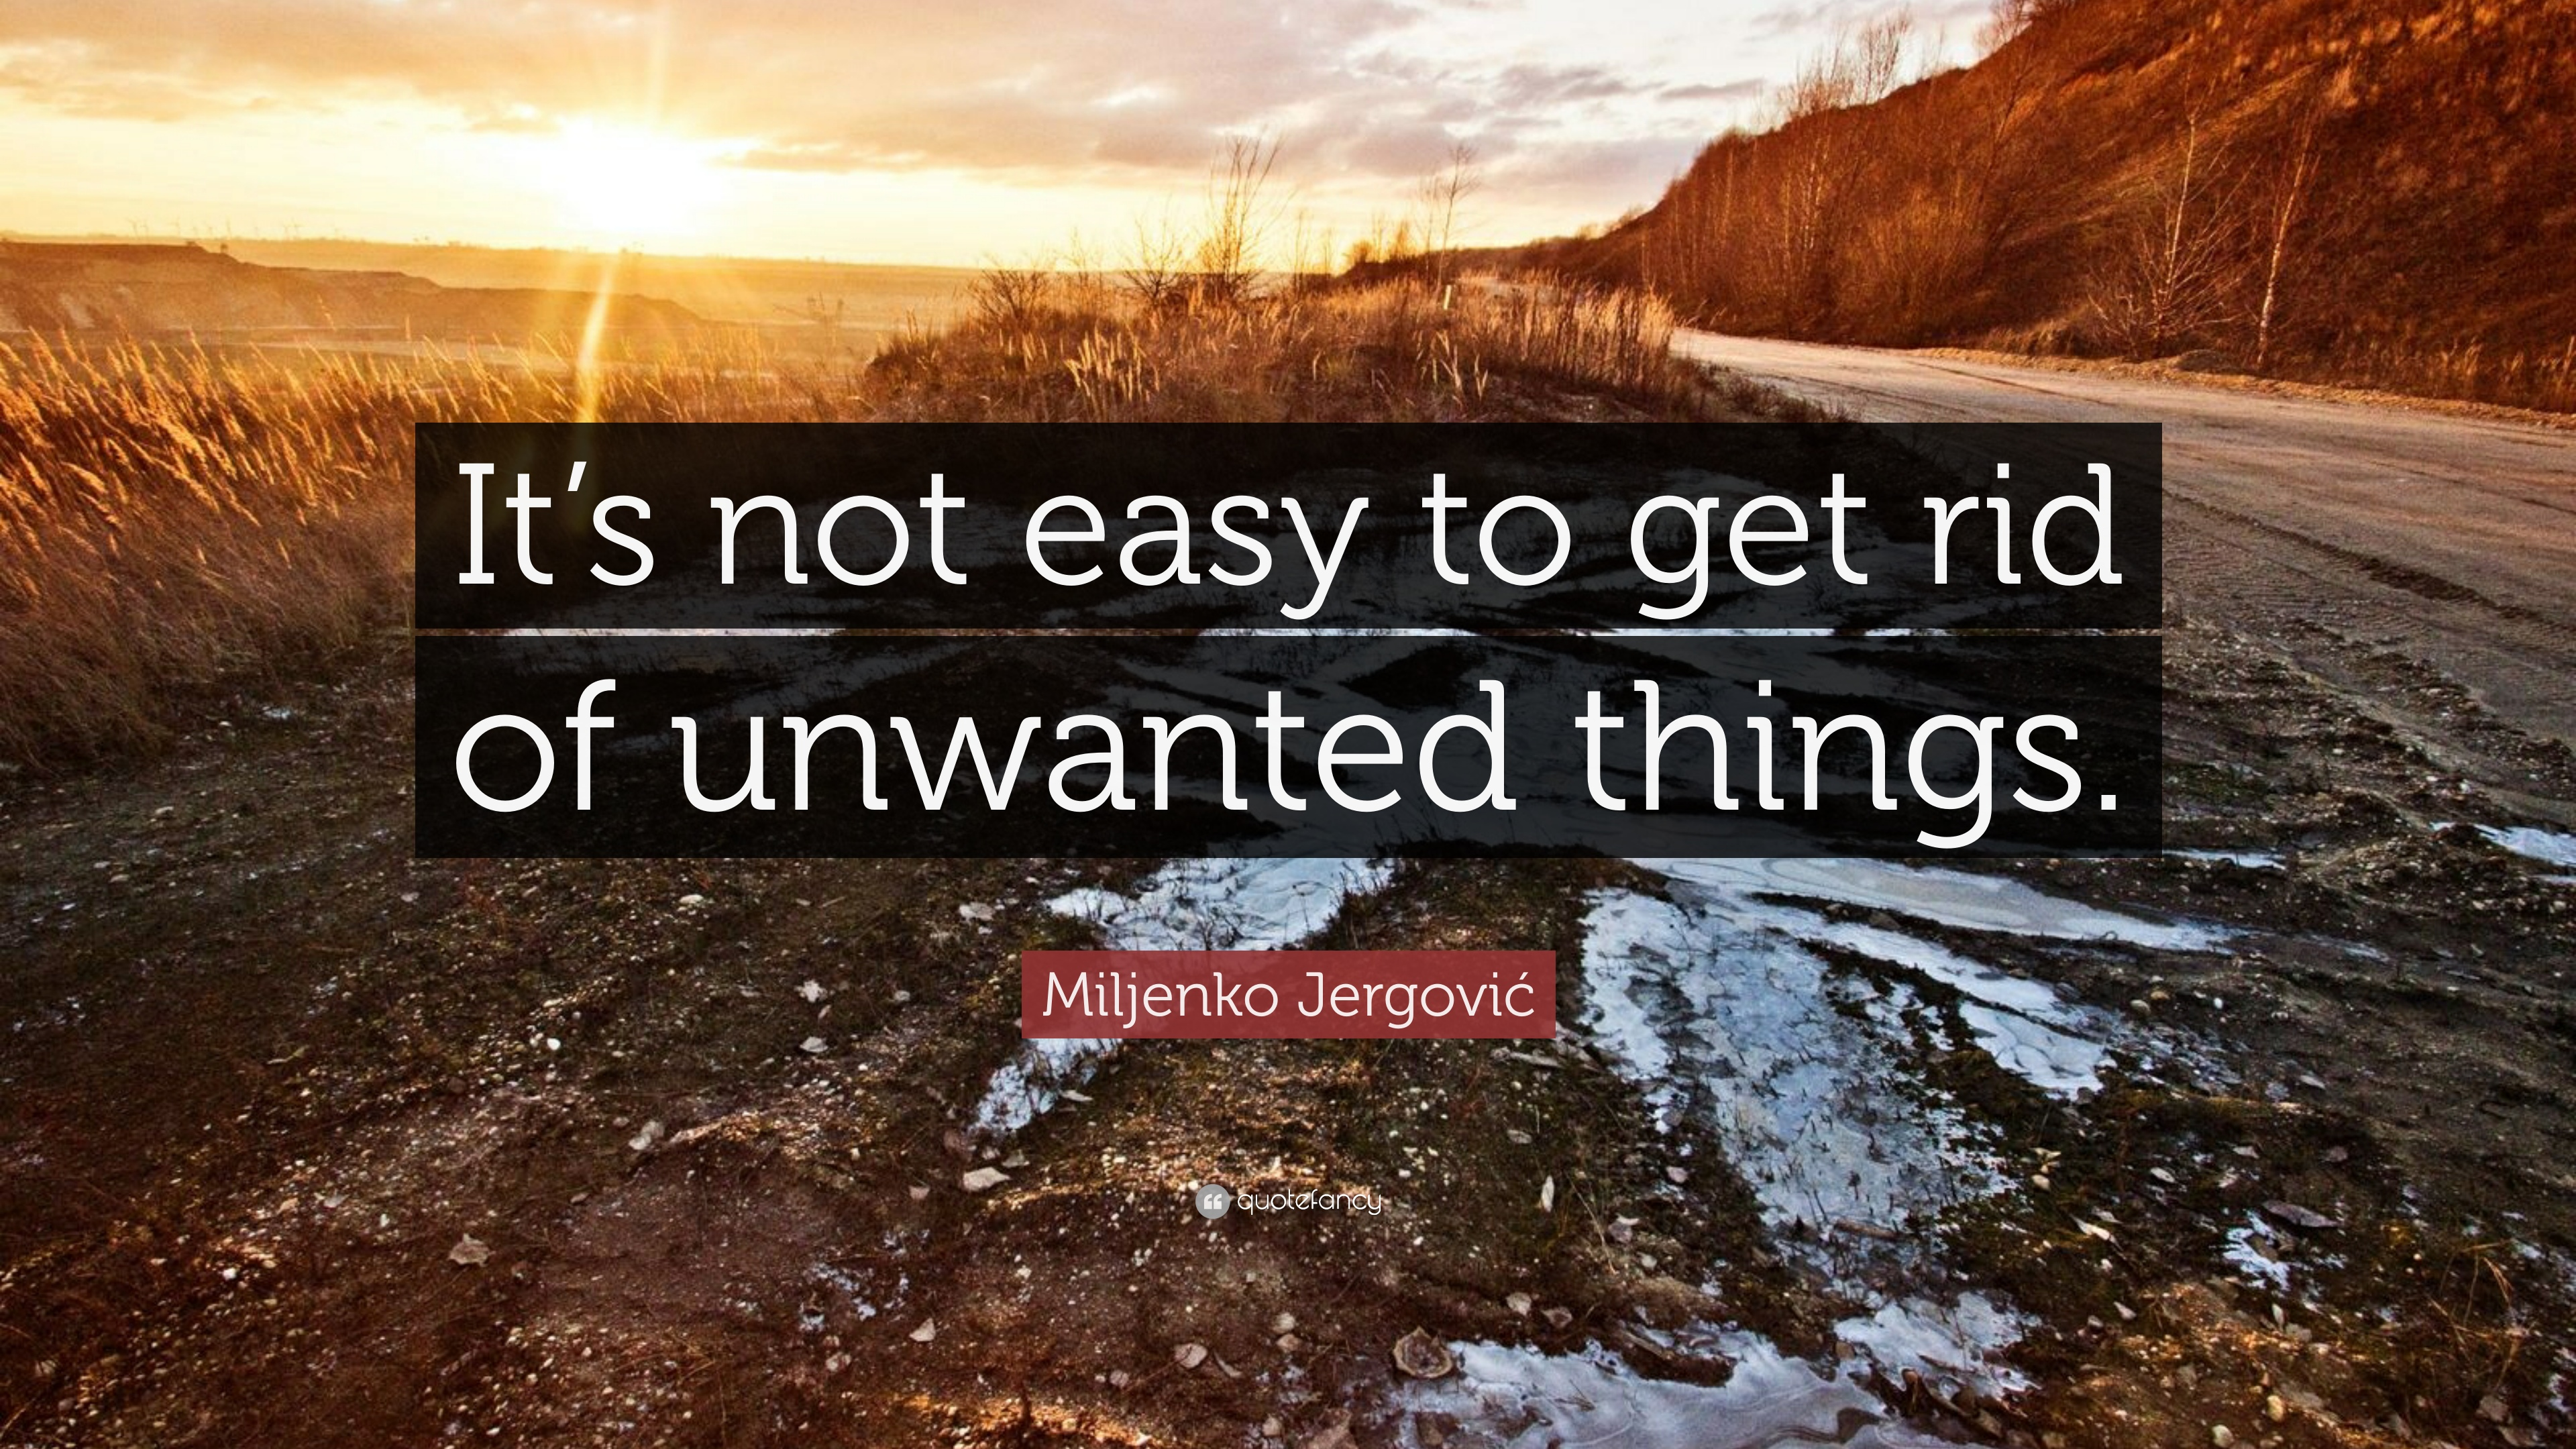 miljenko jergović quote u201cit u0027s not easy to get rid of unwanted